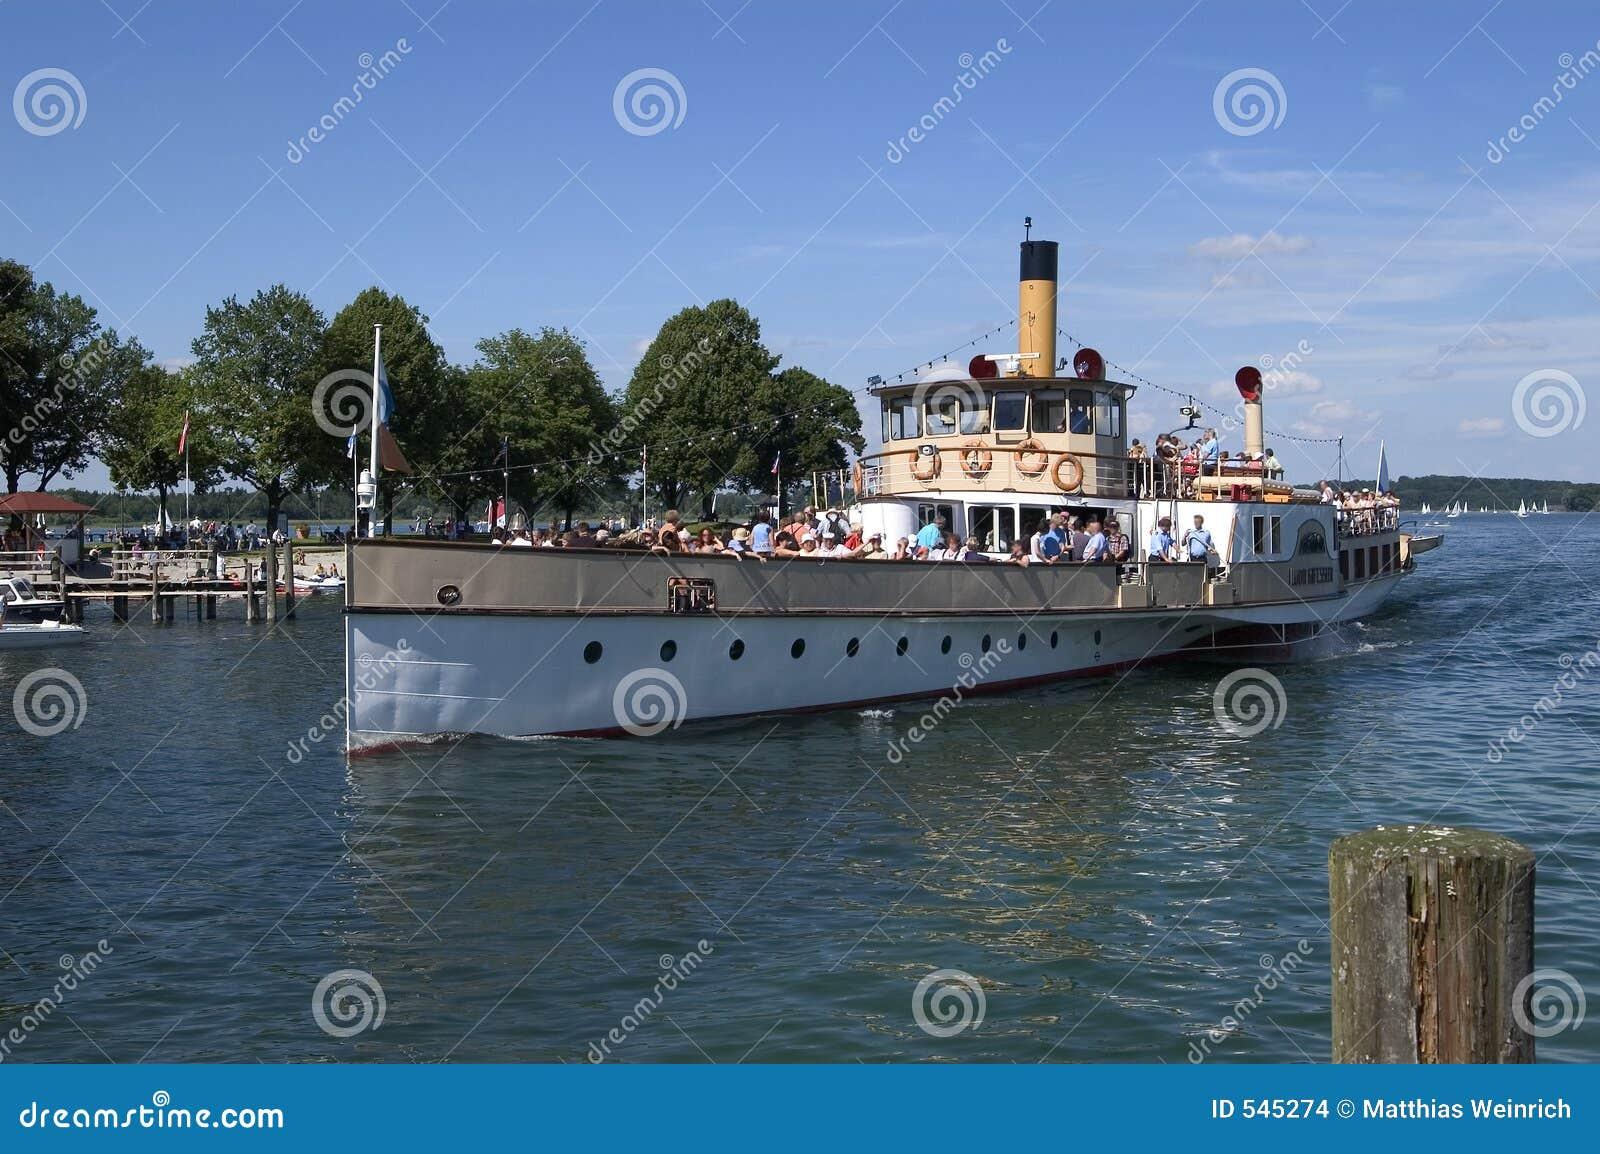 Download 汽船 库存照片. 图片 包括有 旅游业, 海洋, 小船, 汽船, 海边, 本质, 巴伐利亚人, 淫秽, 火轮 - 545274